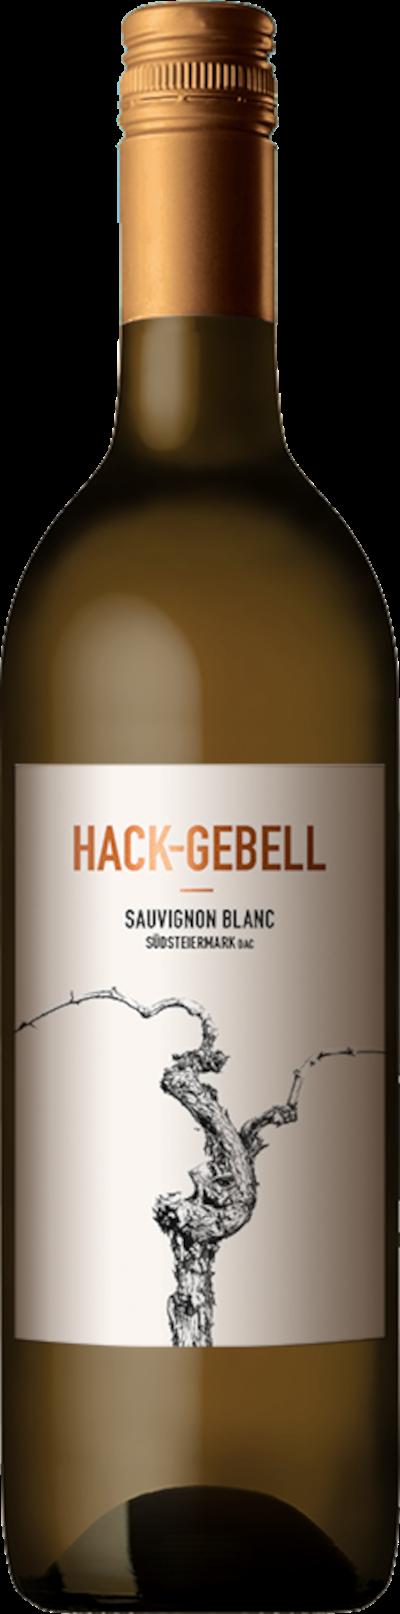 Hack-Gebell - Sauvignon Blanc Südsteiermark DAC